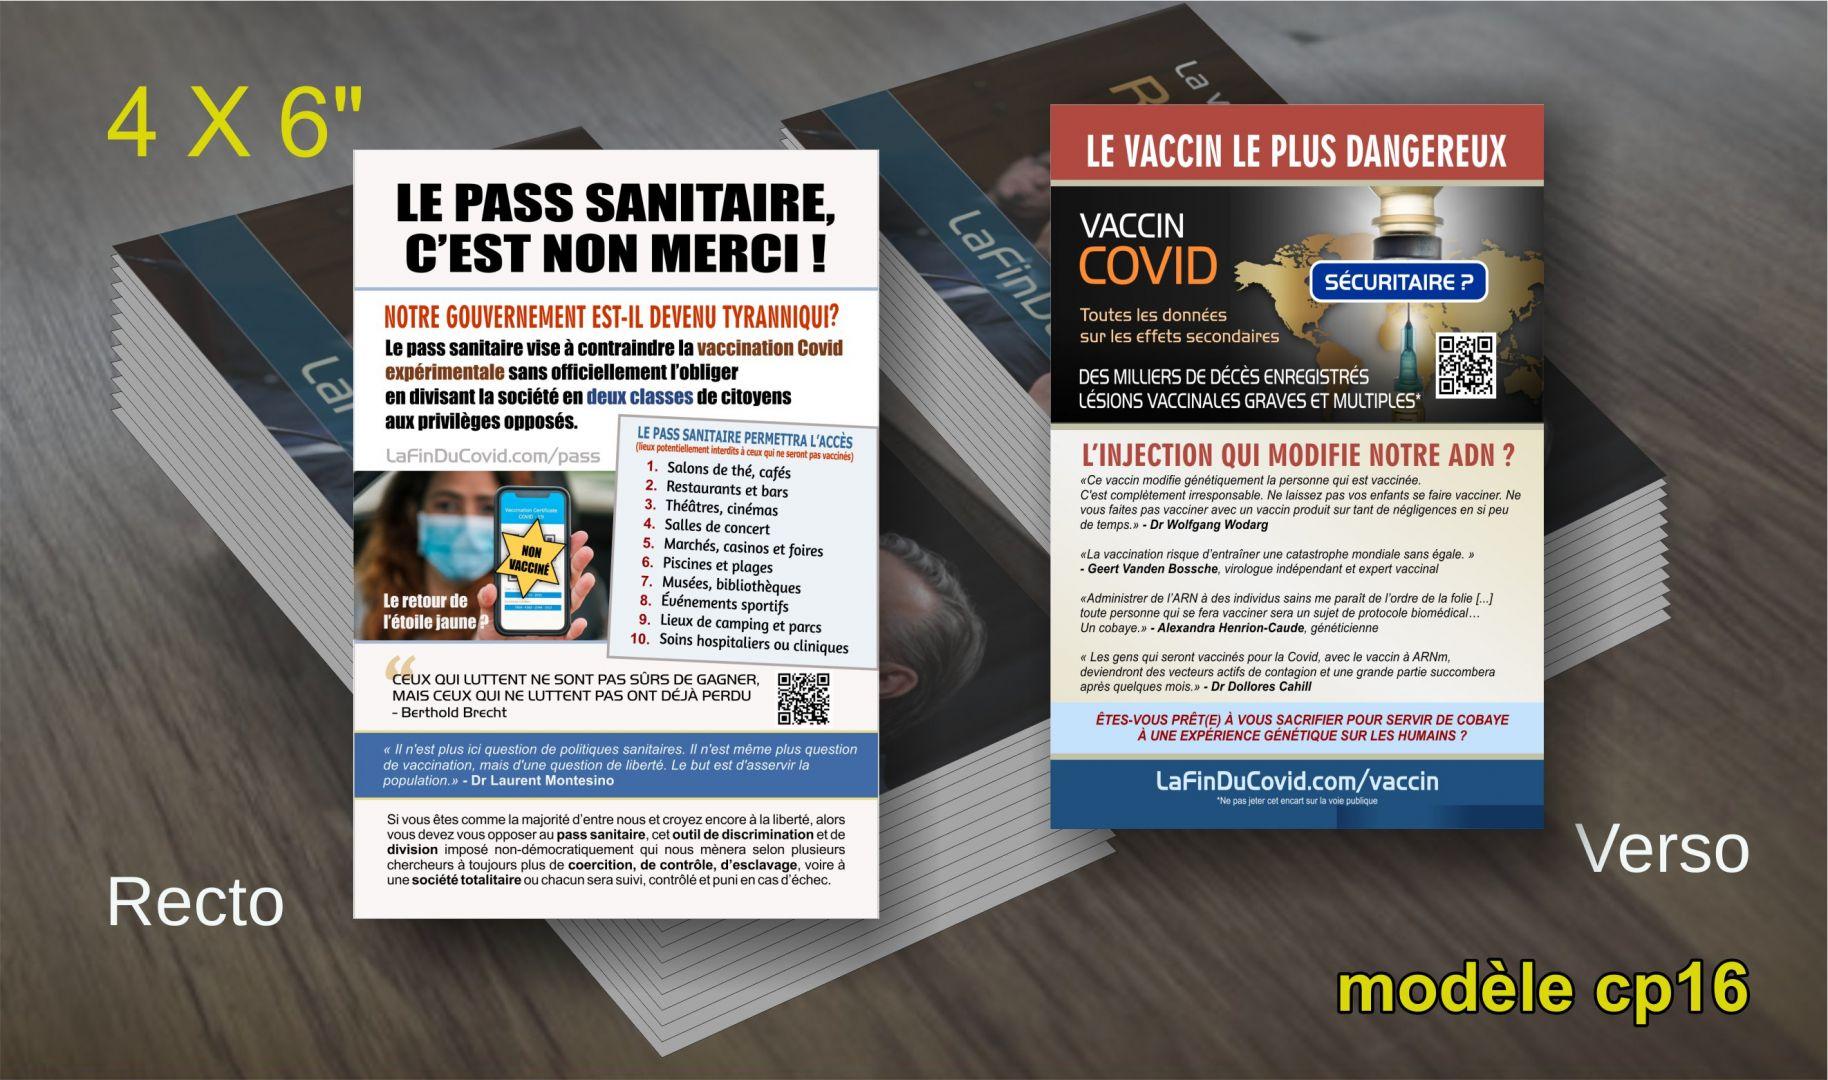 Cartes Postales (4x6) - (Pass sanitaire non merci - Dangers vaccin ARNm)